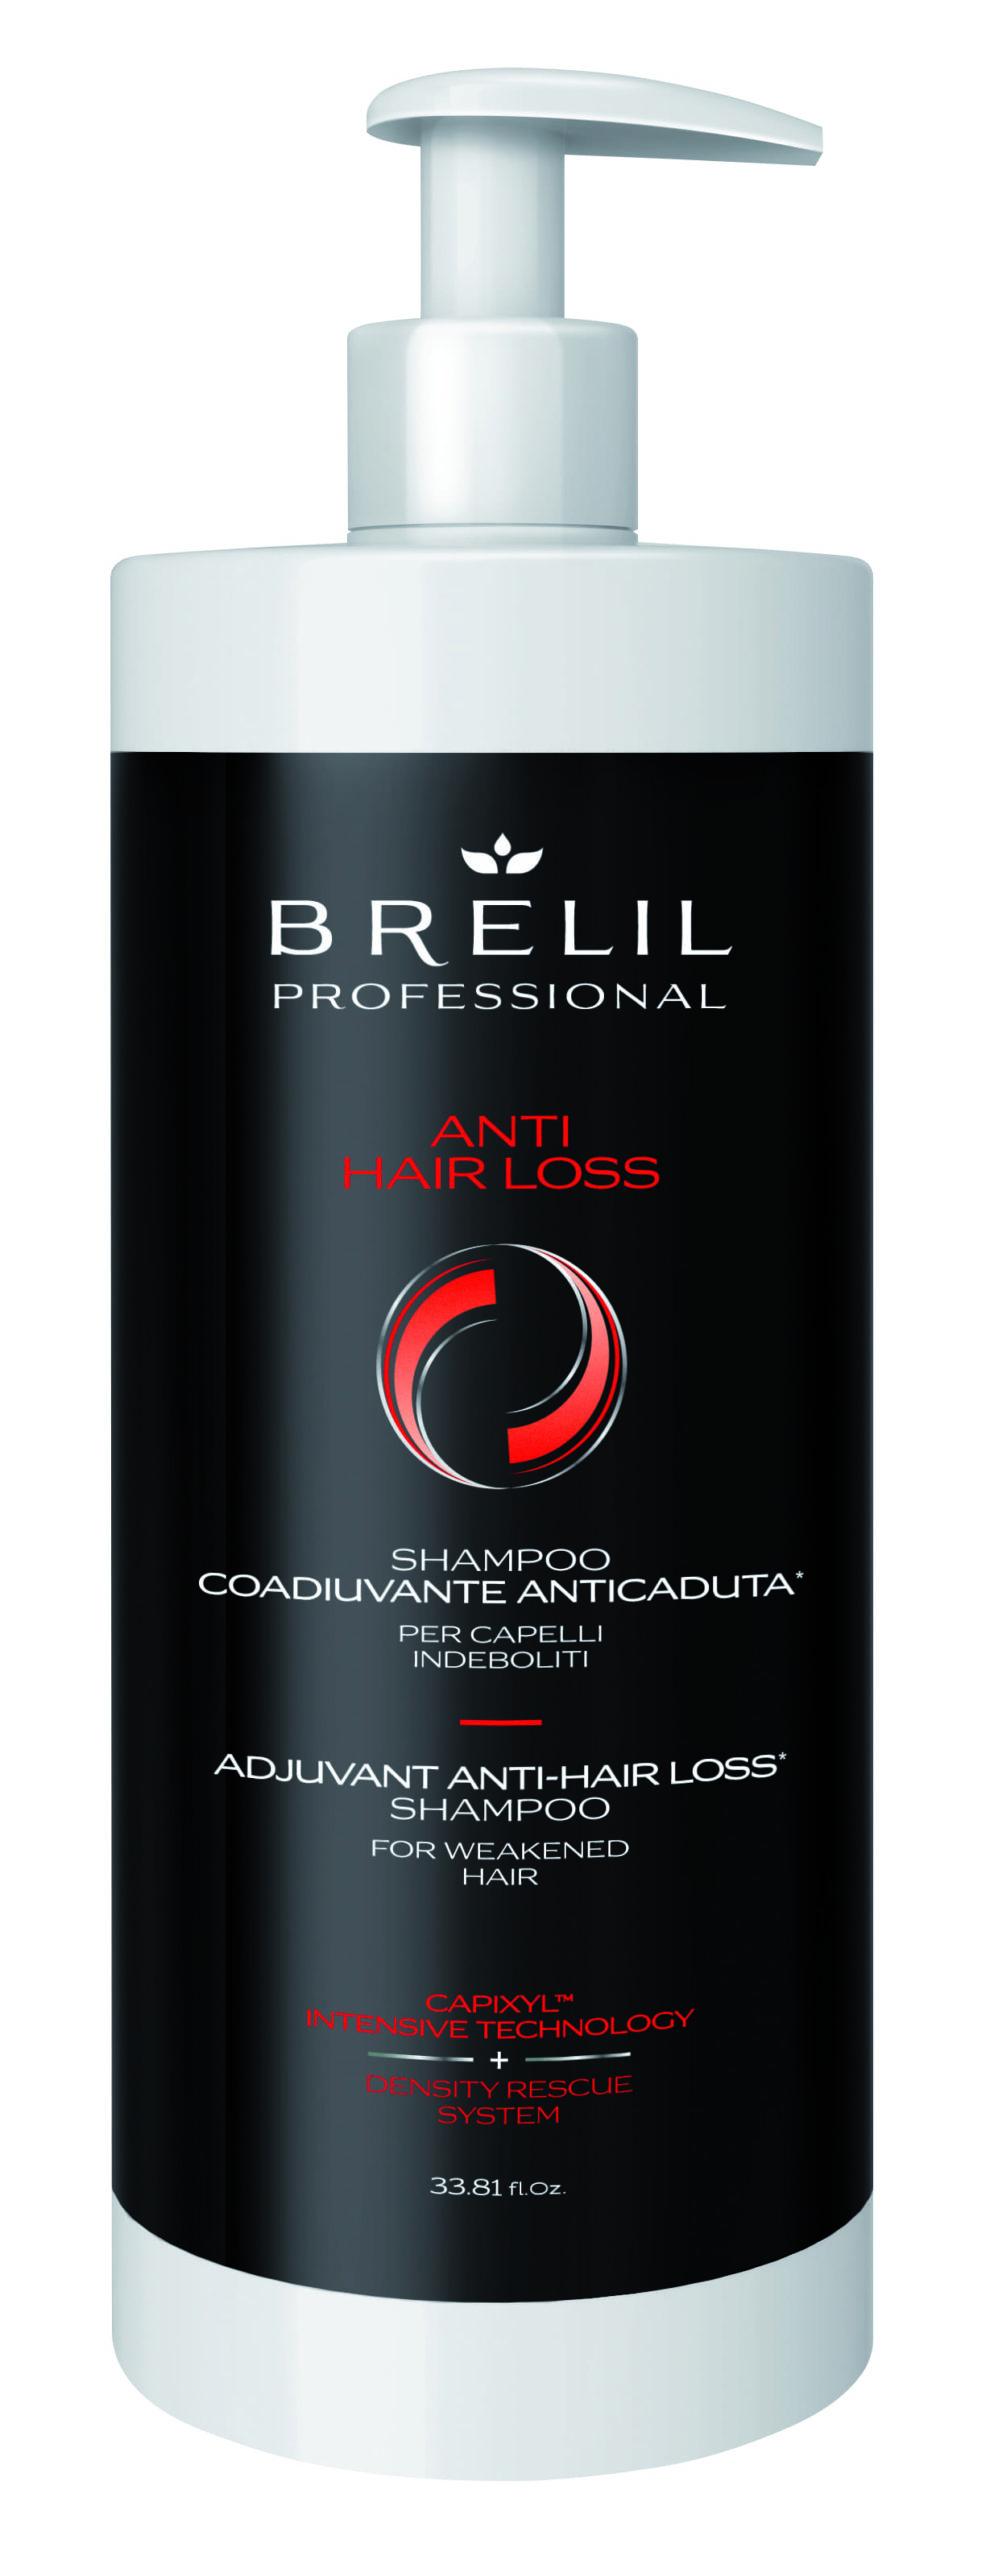 BrelilAntihairloss shampoo1000 scaled 1 - Краска для волос Колорианн Престиж, 100 мл